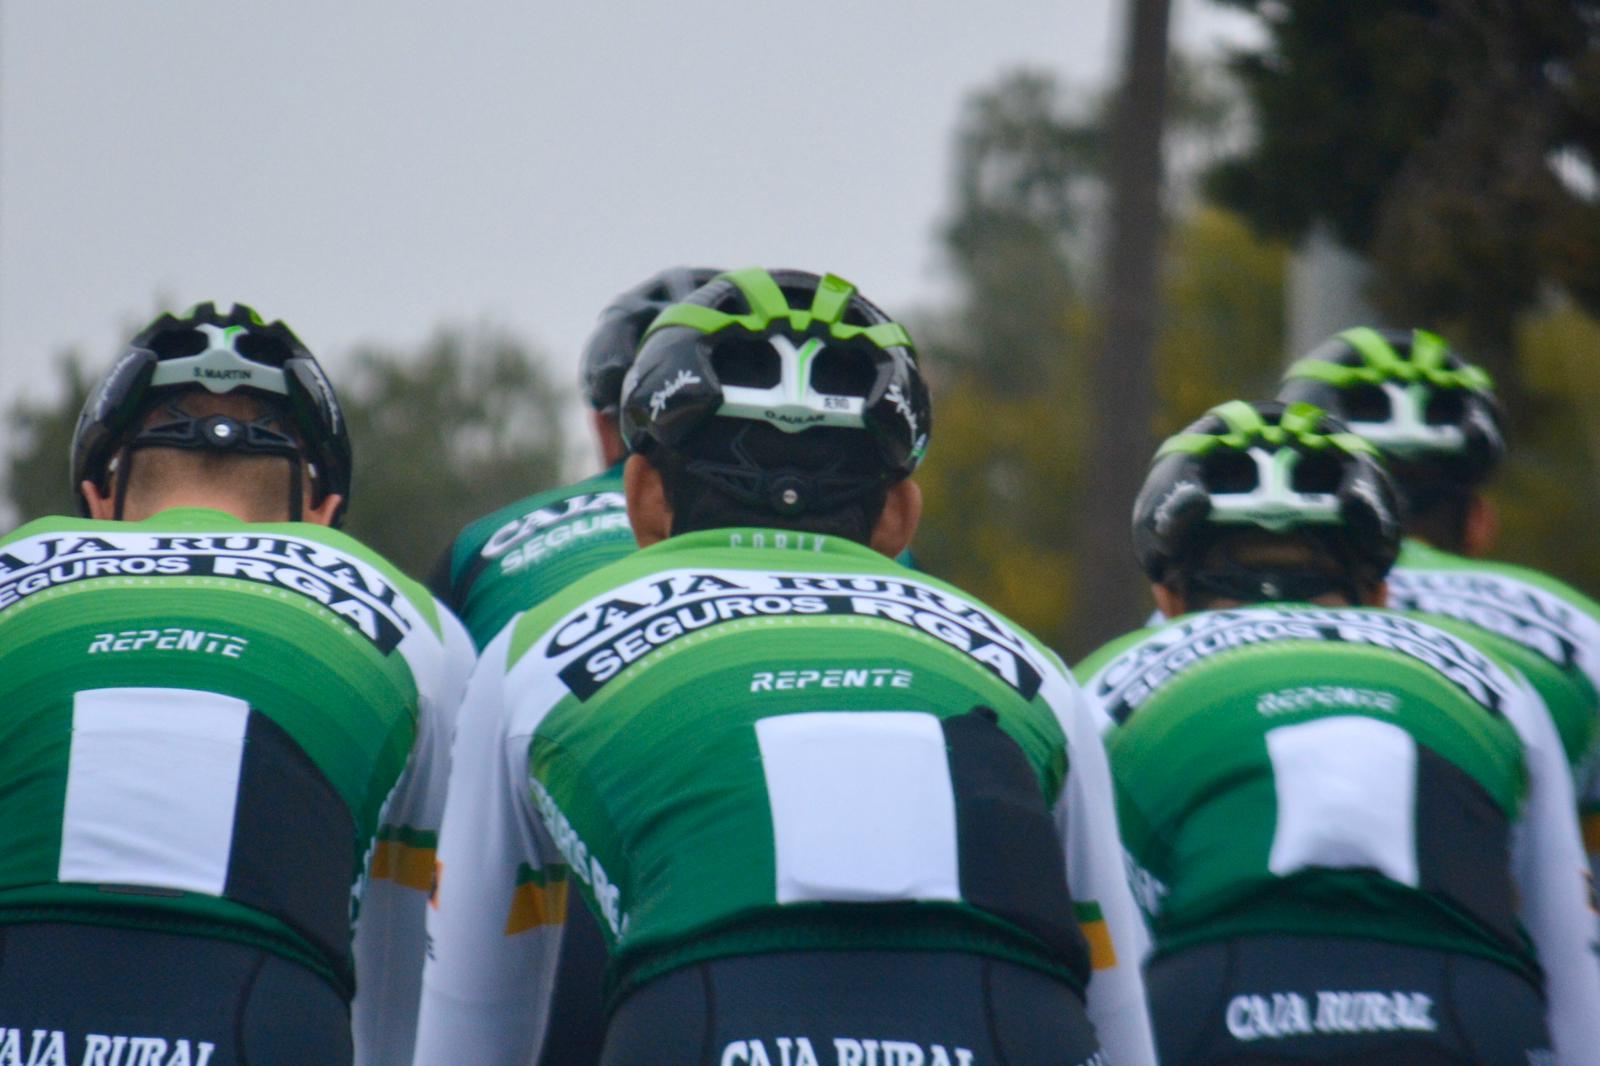 Dopage - L'équipe Caja Rural-Seguros RGA évite la suspension